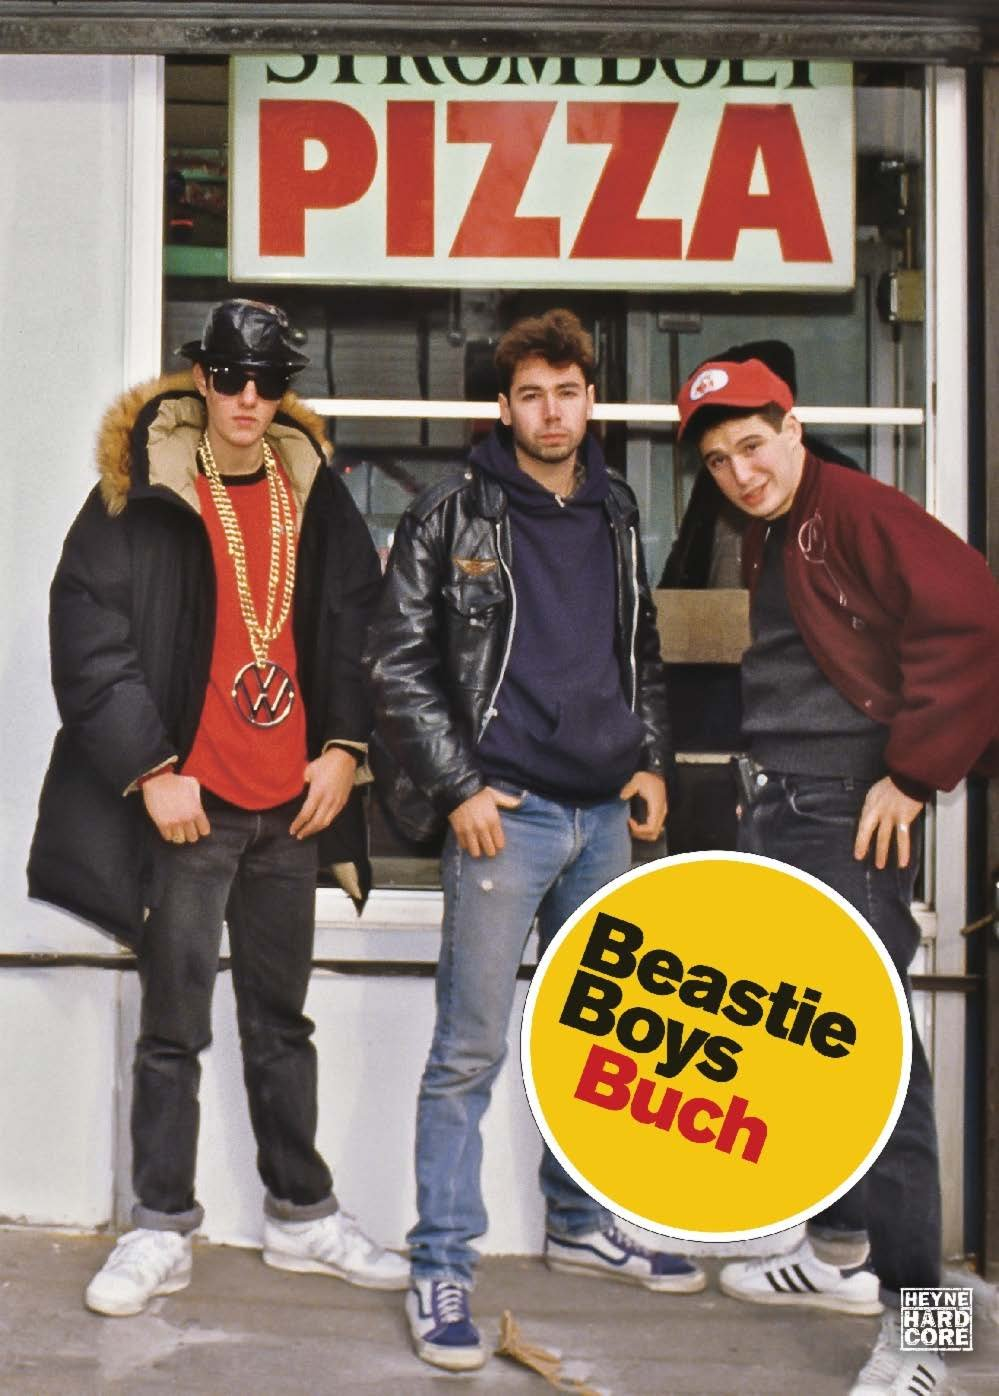 Beastie_Boys_Seite_01